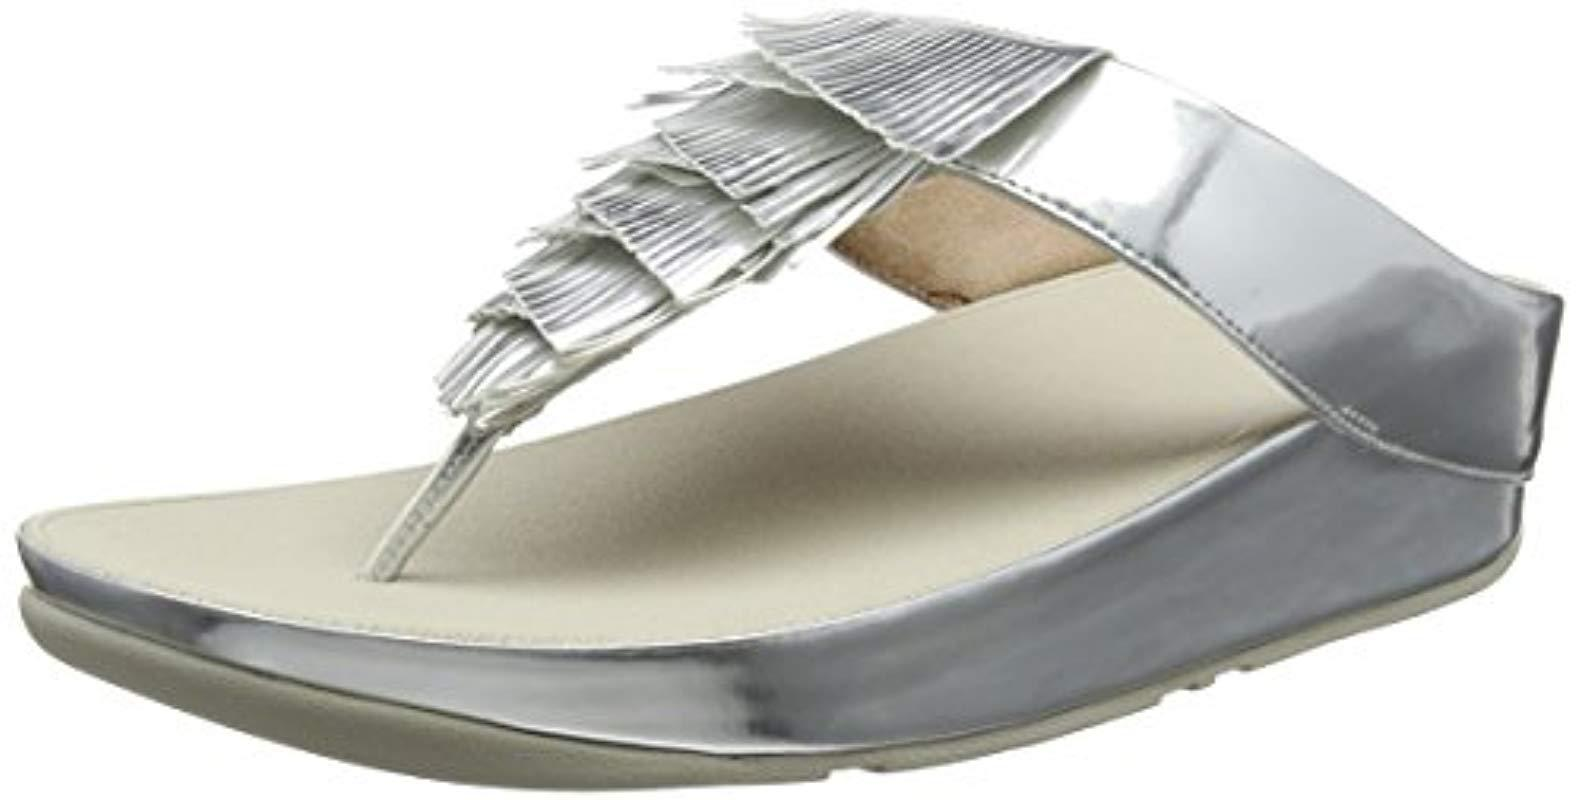 47b6499877435 Fitflop Metallic Cha Fringe Toe-thong Sandals in Metallic - Lyst